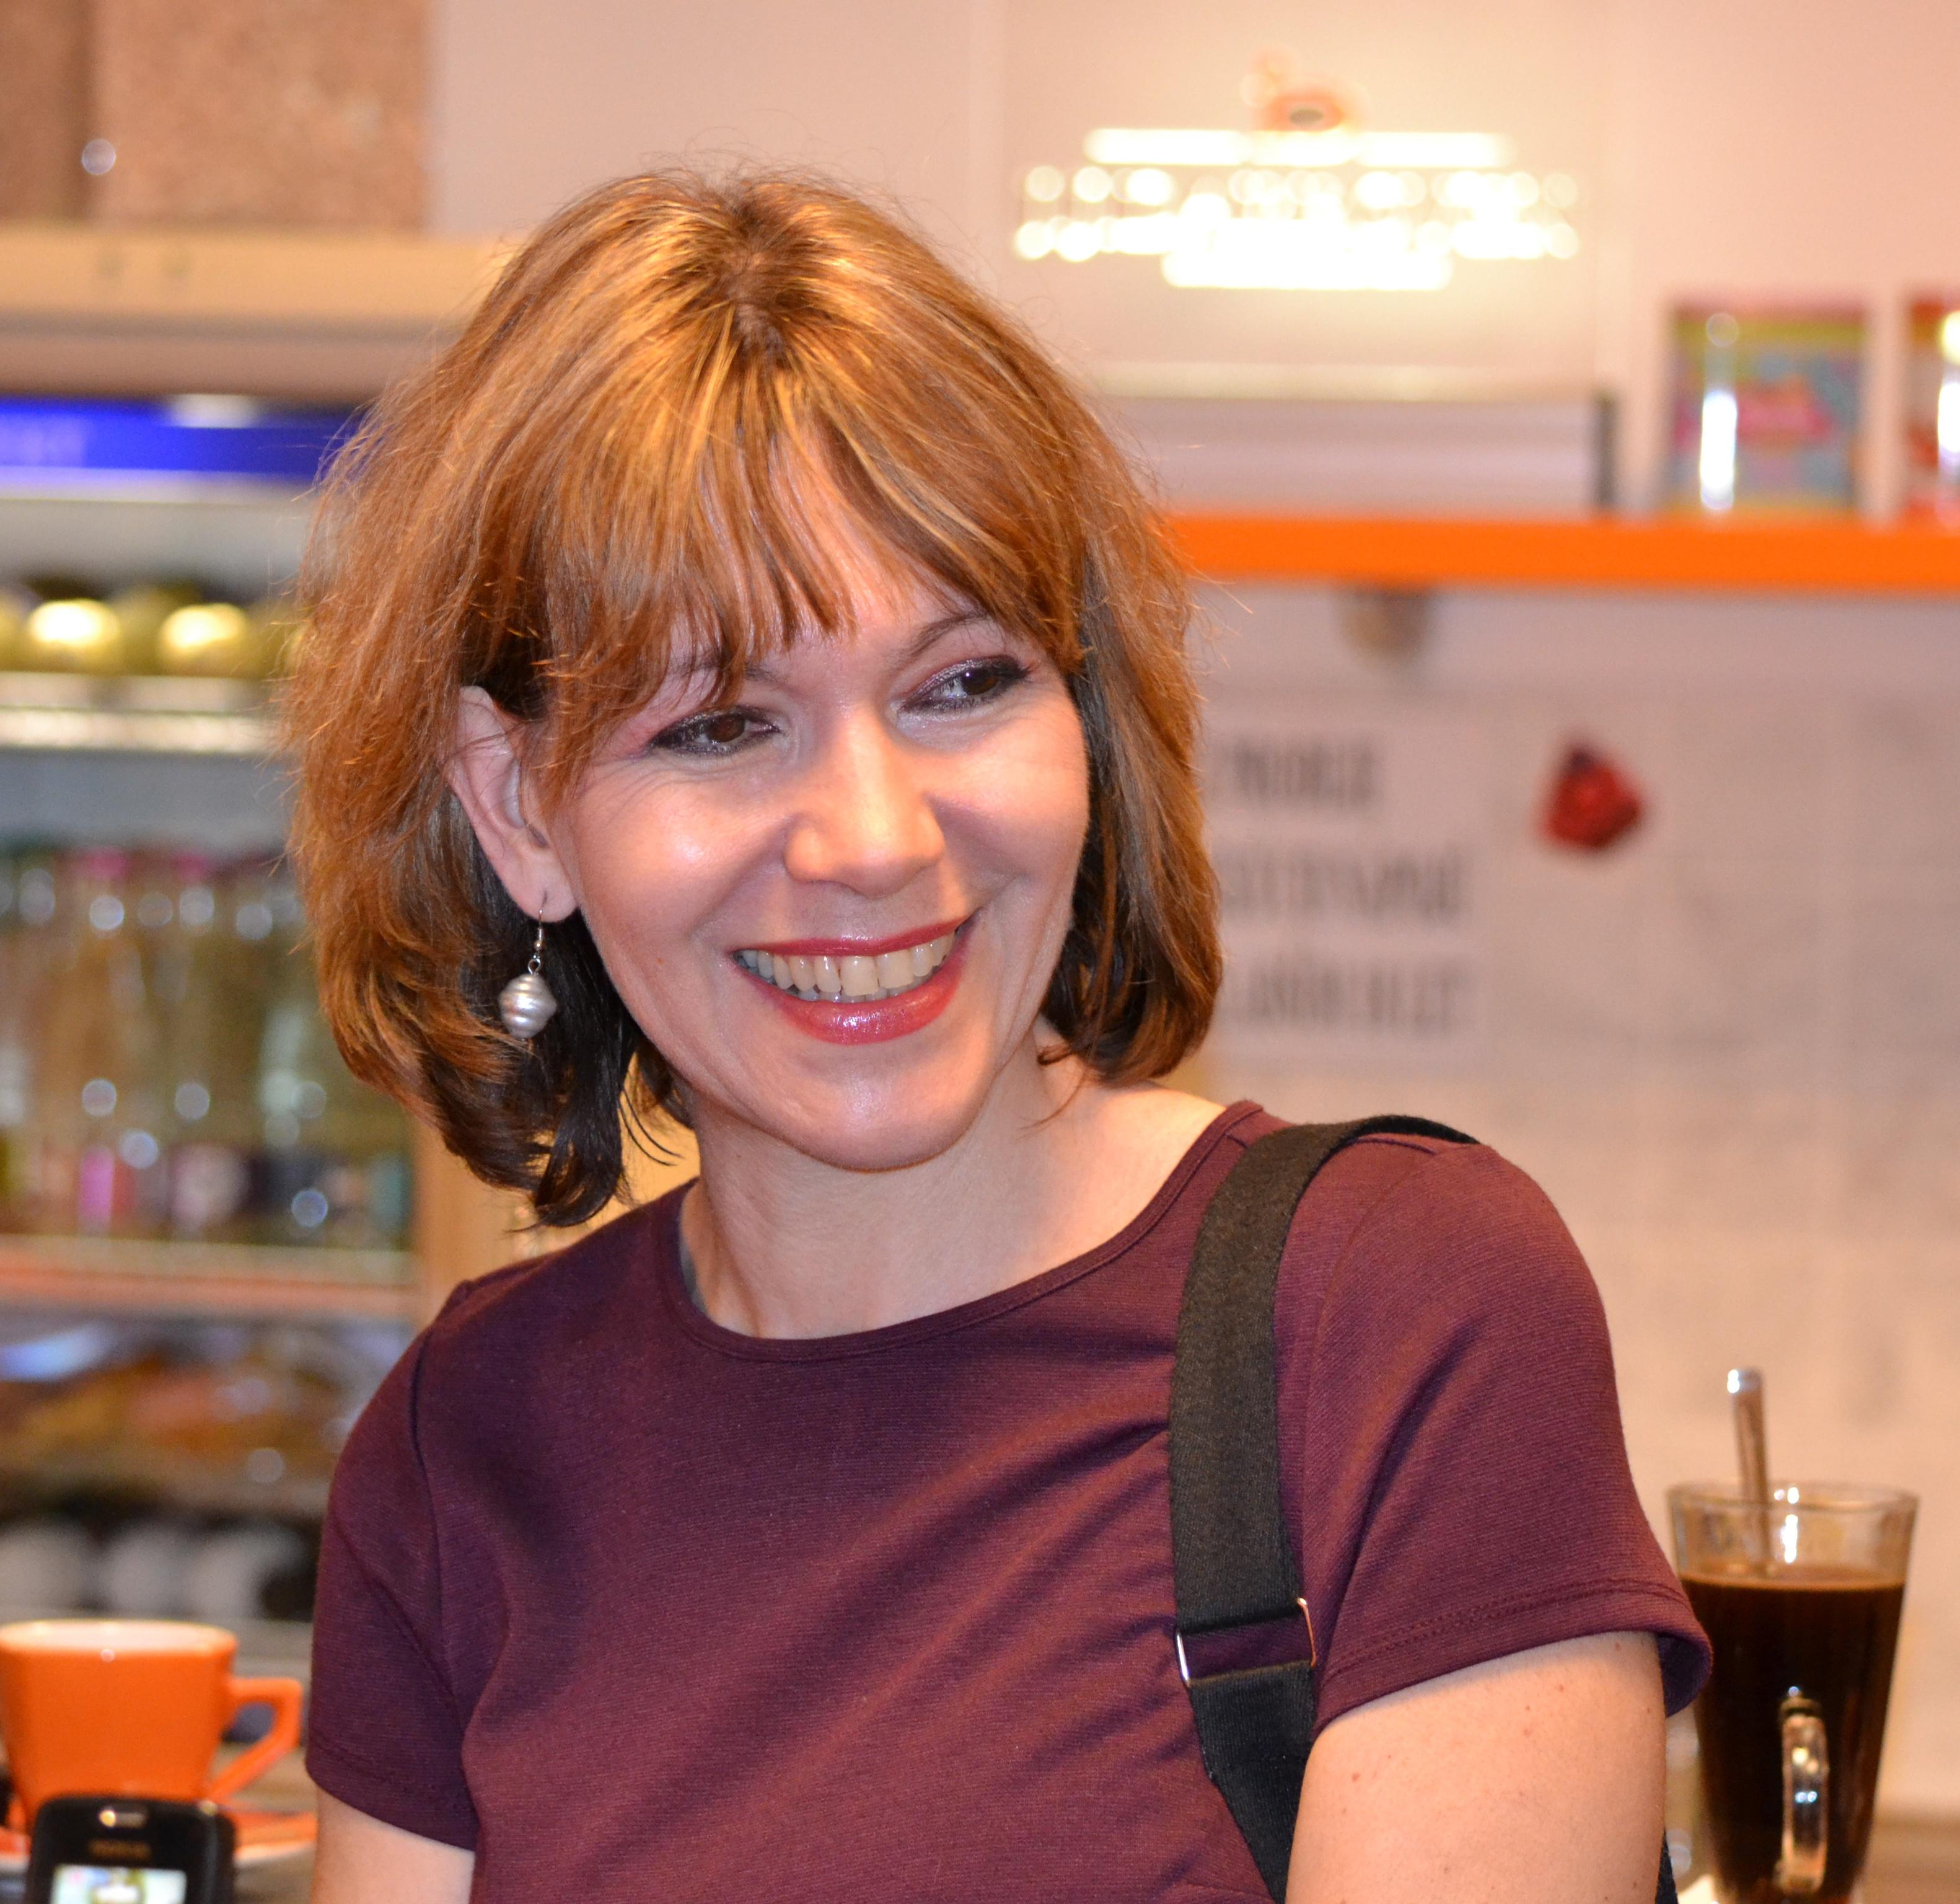 Communication on this topic: Amy Seimetz, anulka-dziubinska/